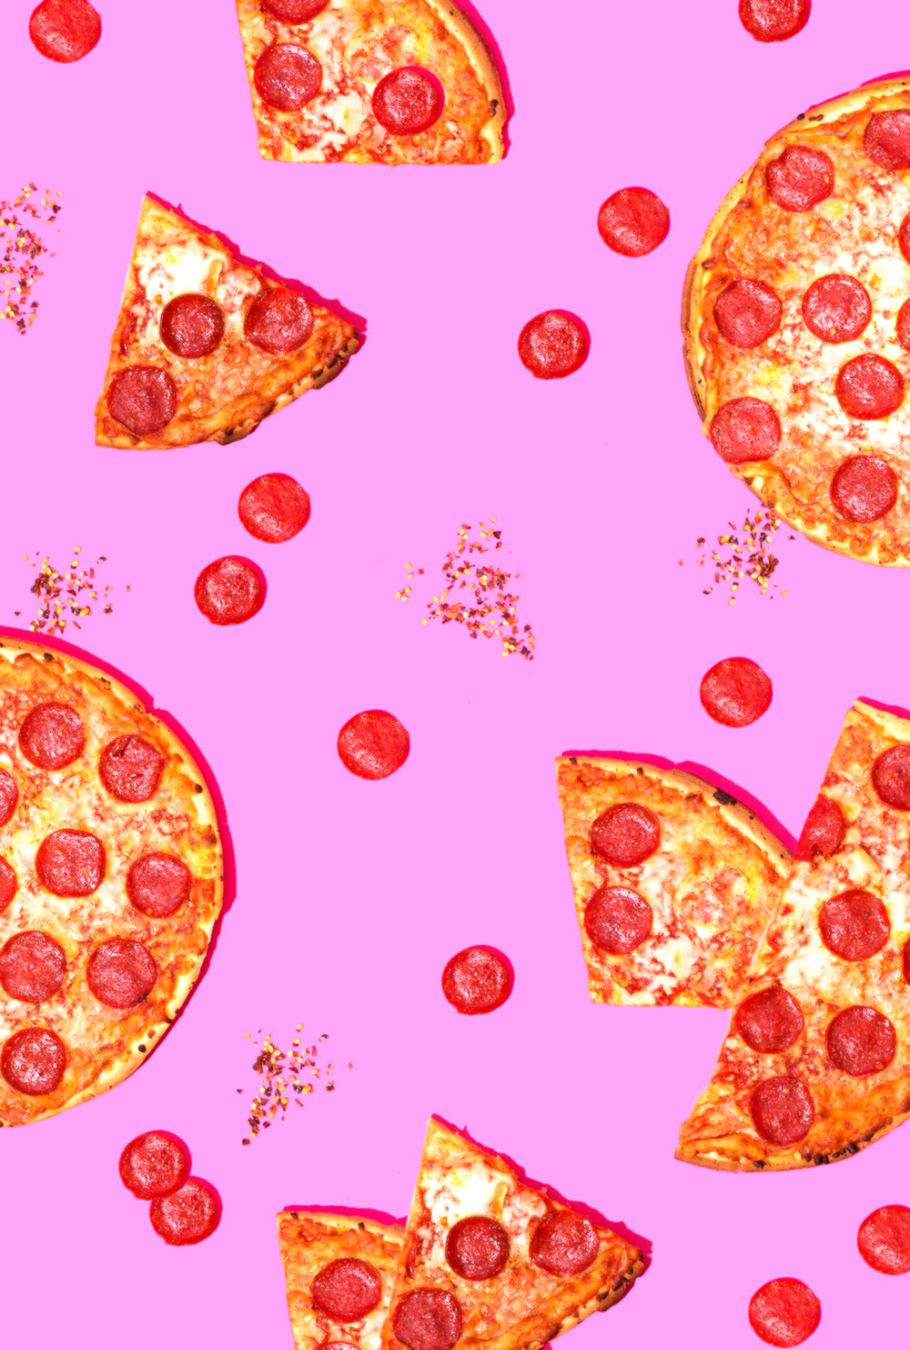 Pizza Party Wallpaper Download — Violet Tinder Studios